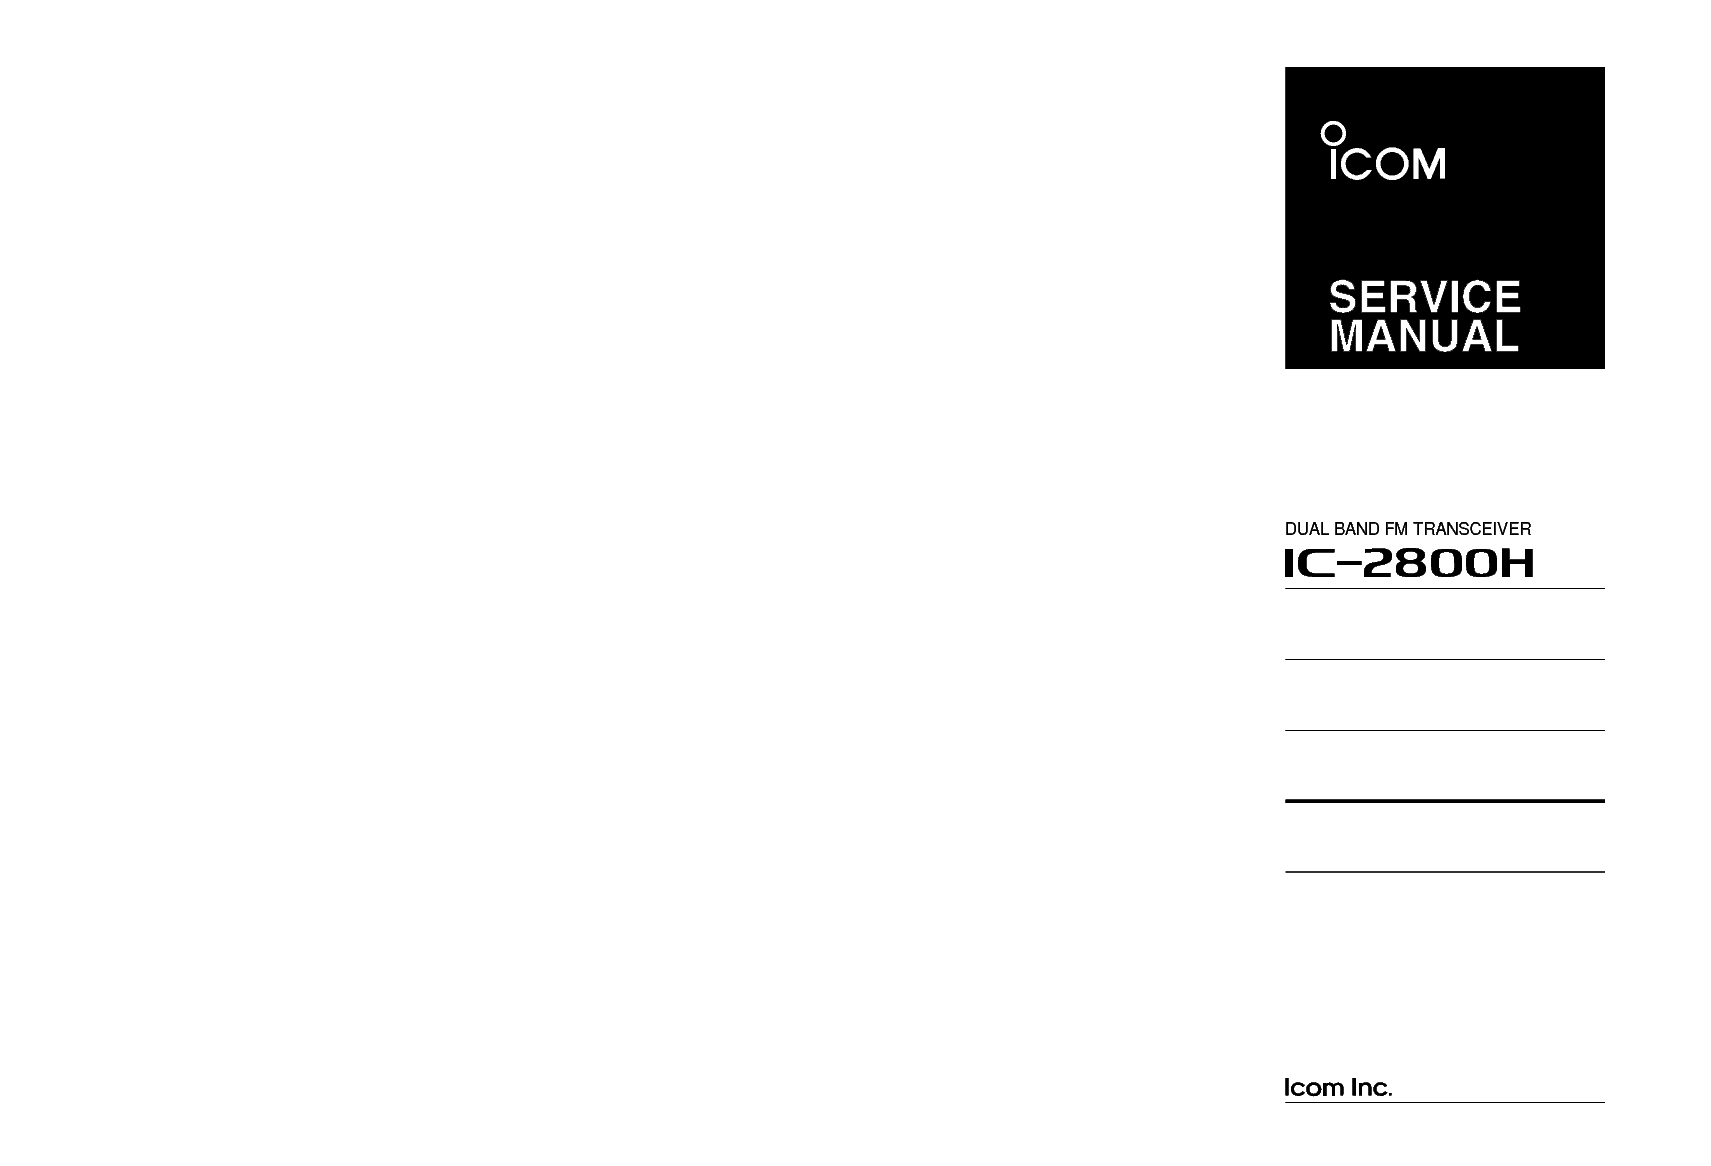 ICOM IC-2800H SERVICE MANUAL service manual (1st page)